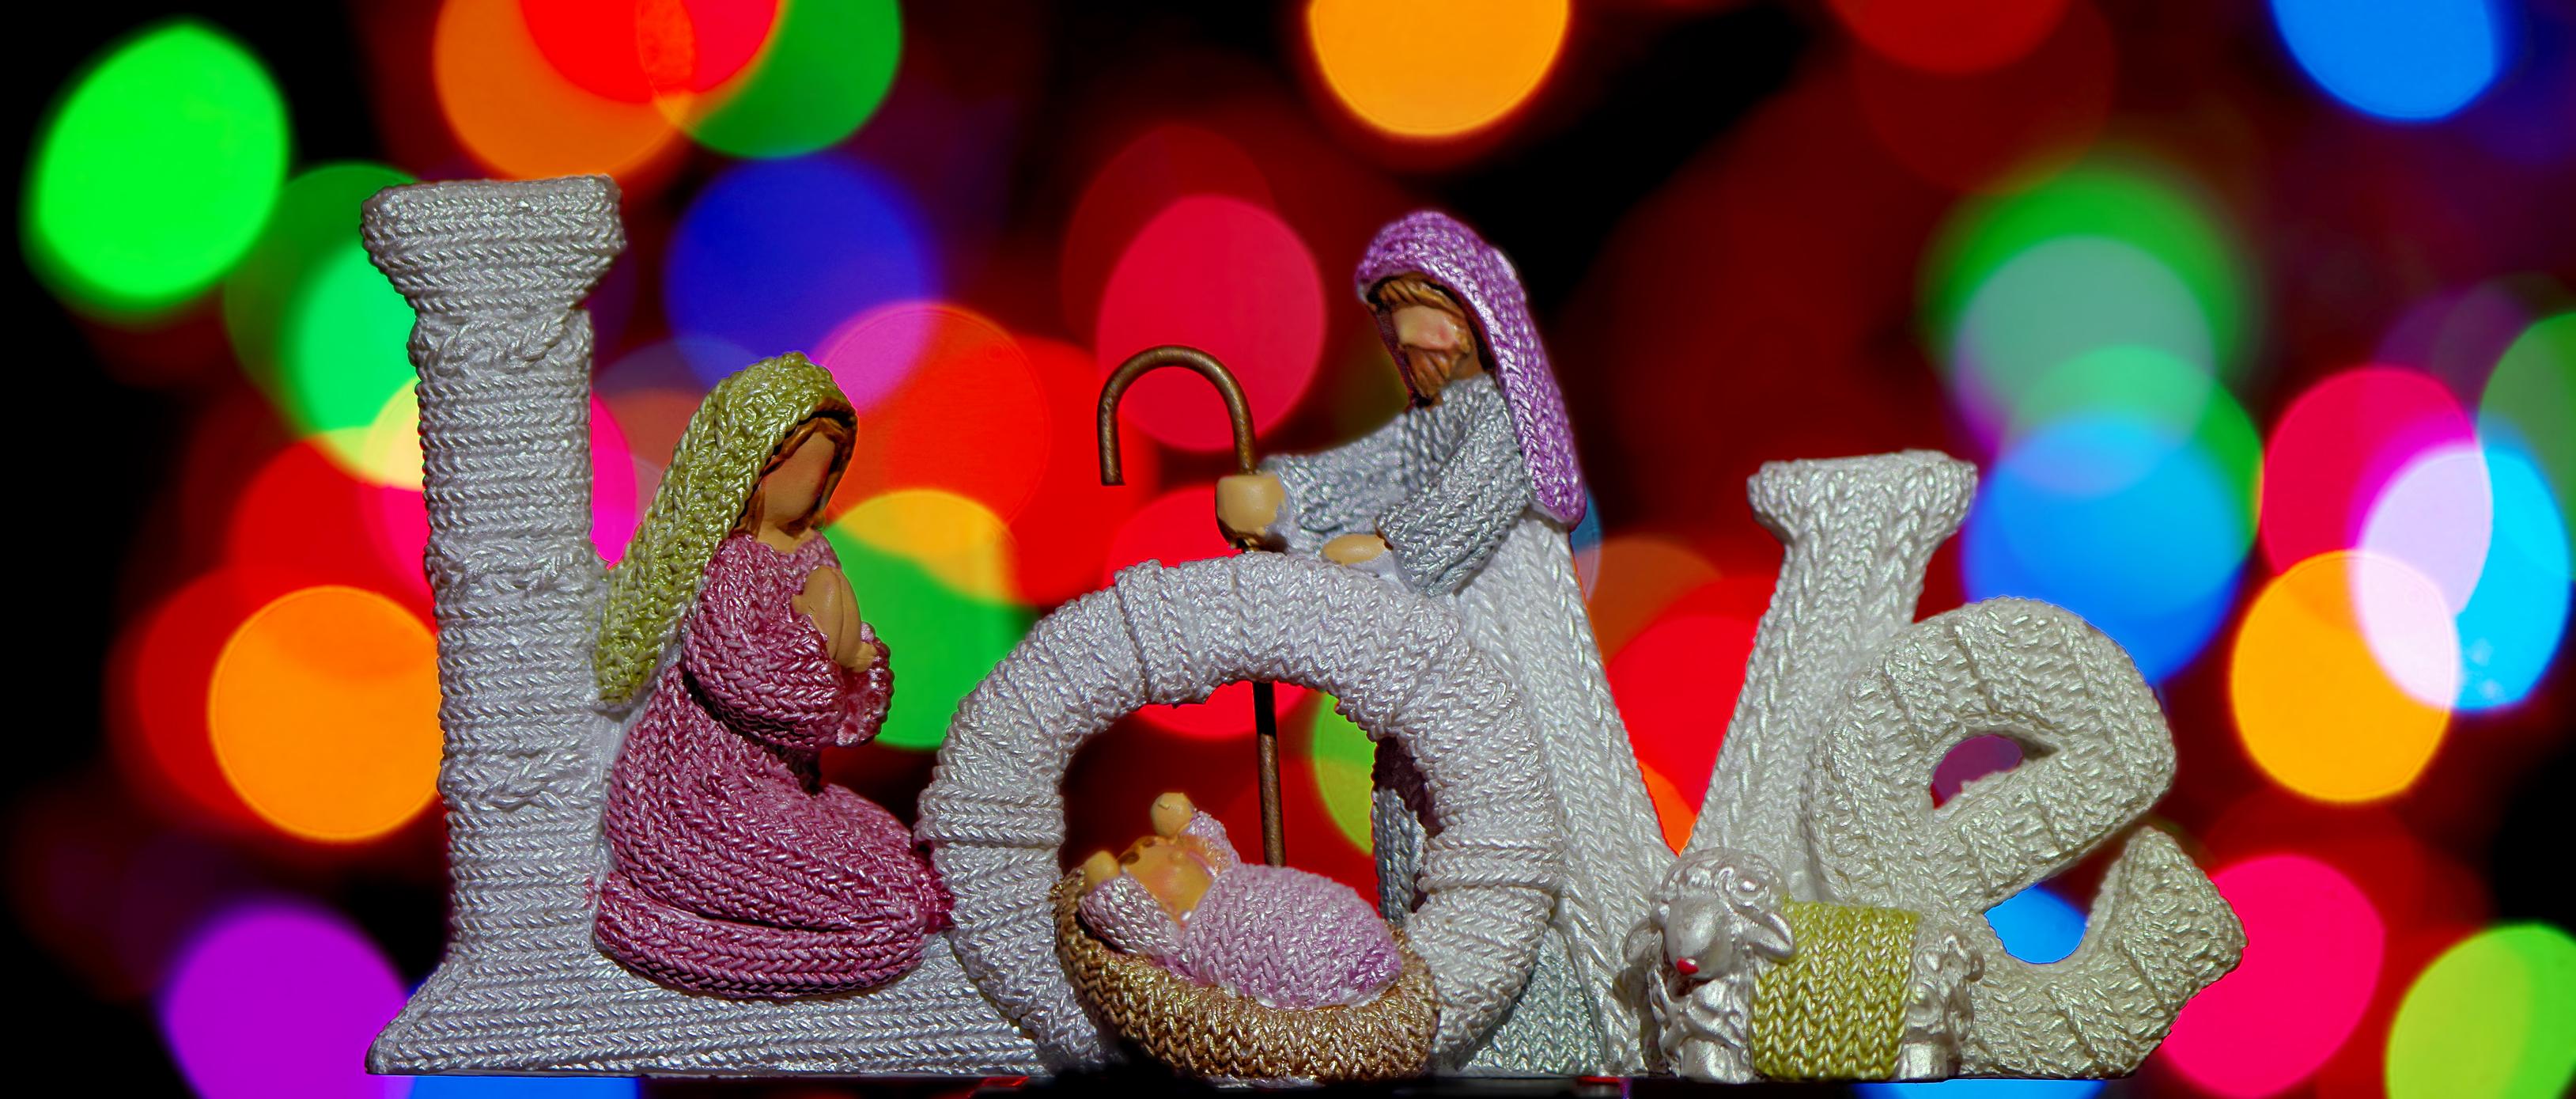 nativitylove